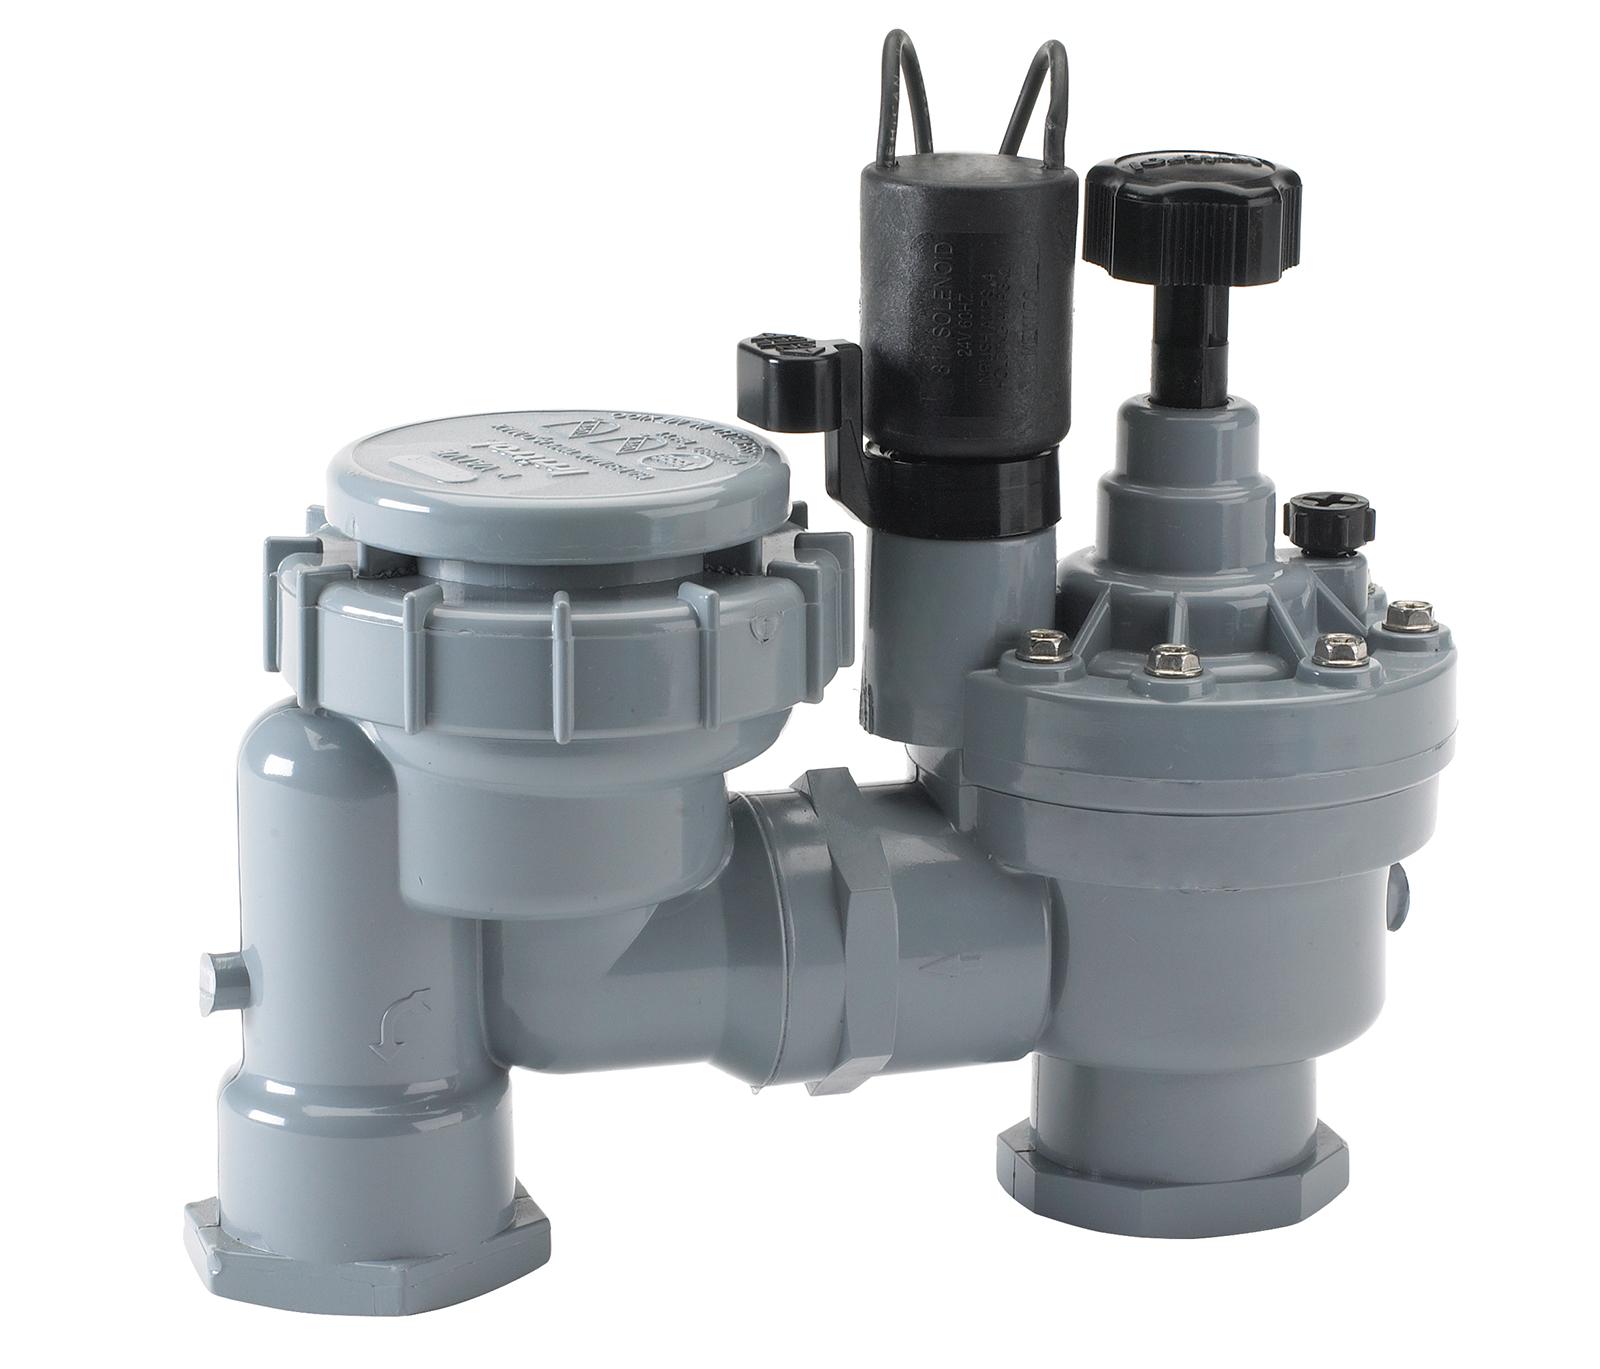 richdel sprinkler valve diagram nissan 1400 electronic distributor wiring irritrol valves 2700 series